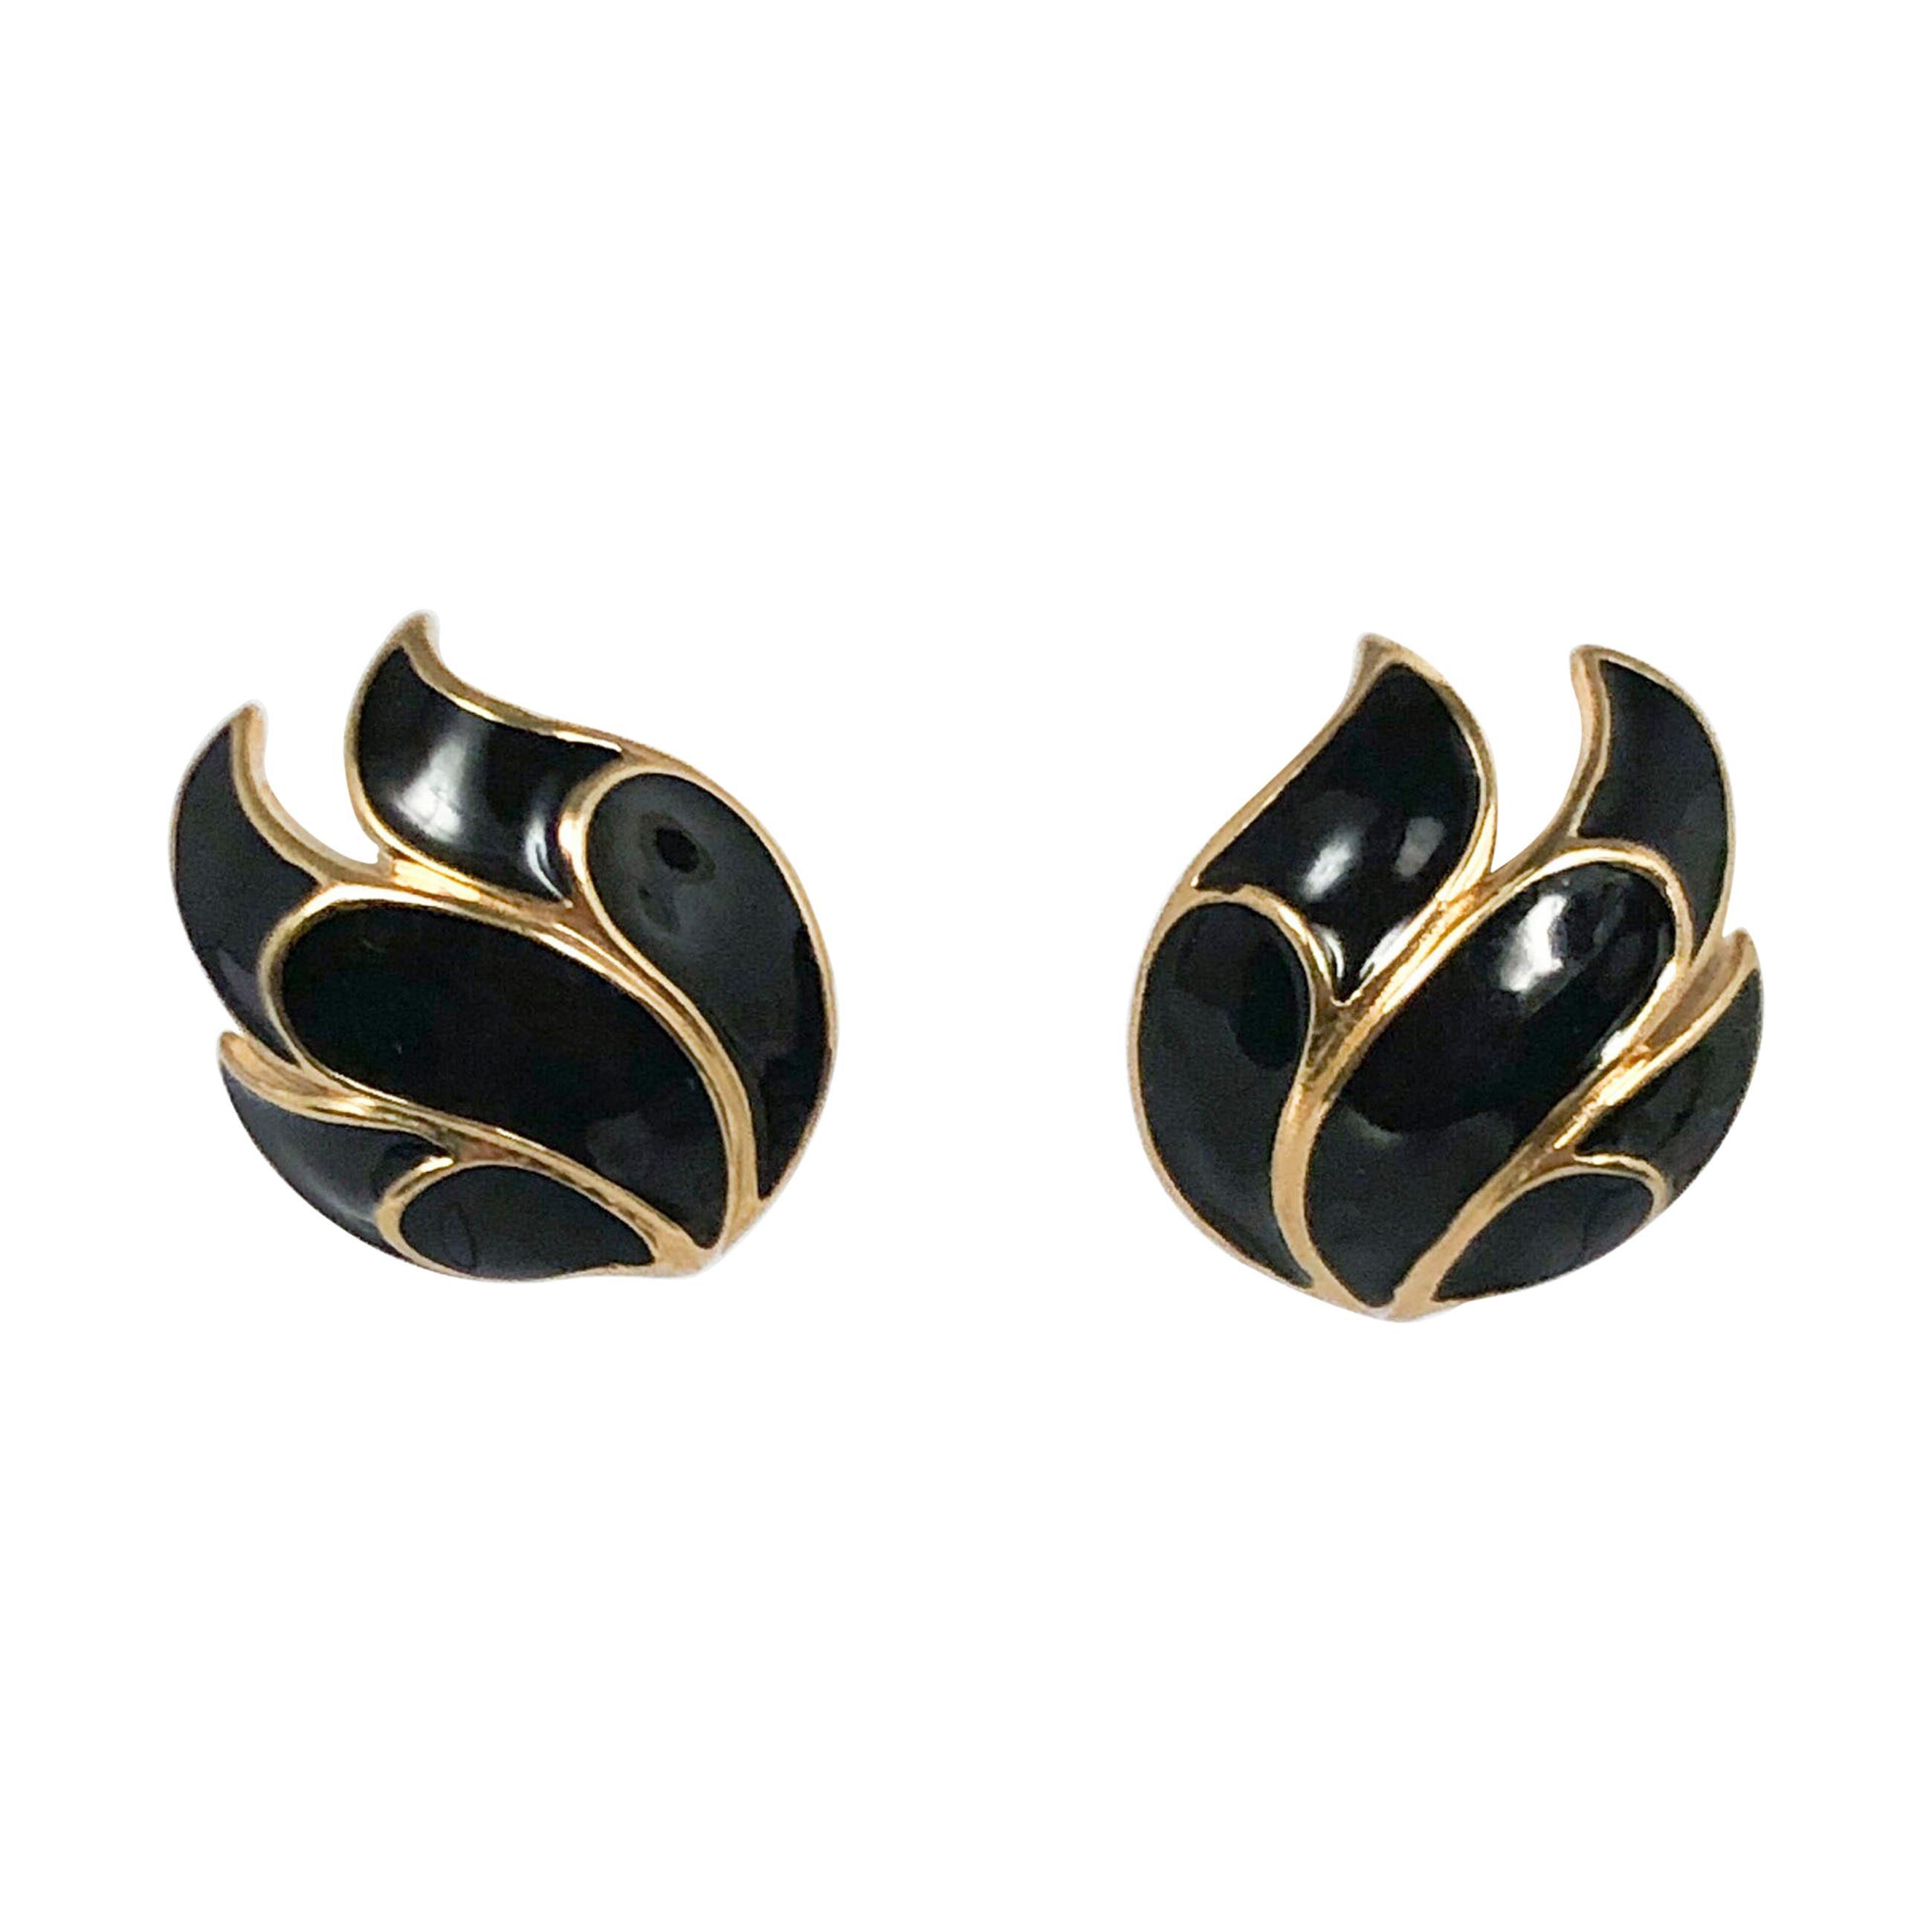 1970s TRIFARI Muted Tones Enameled Post Earrings